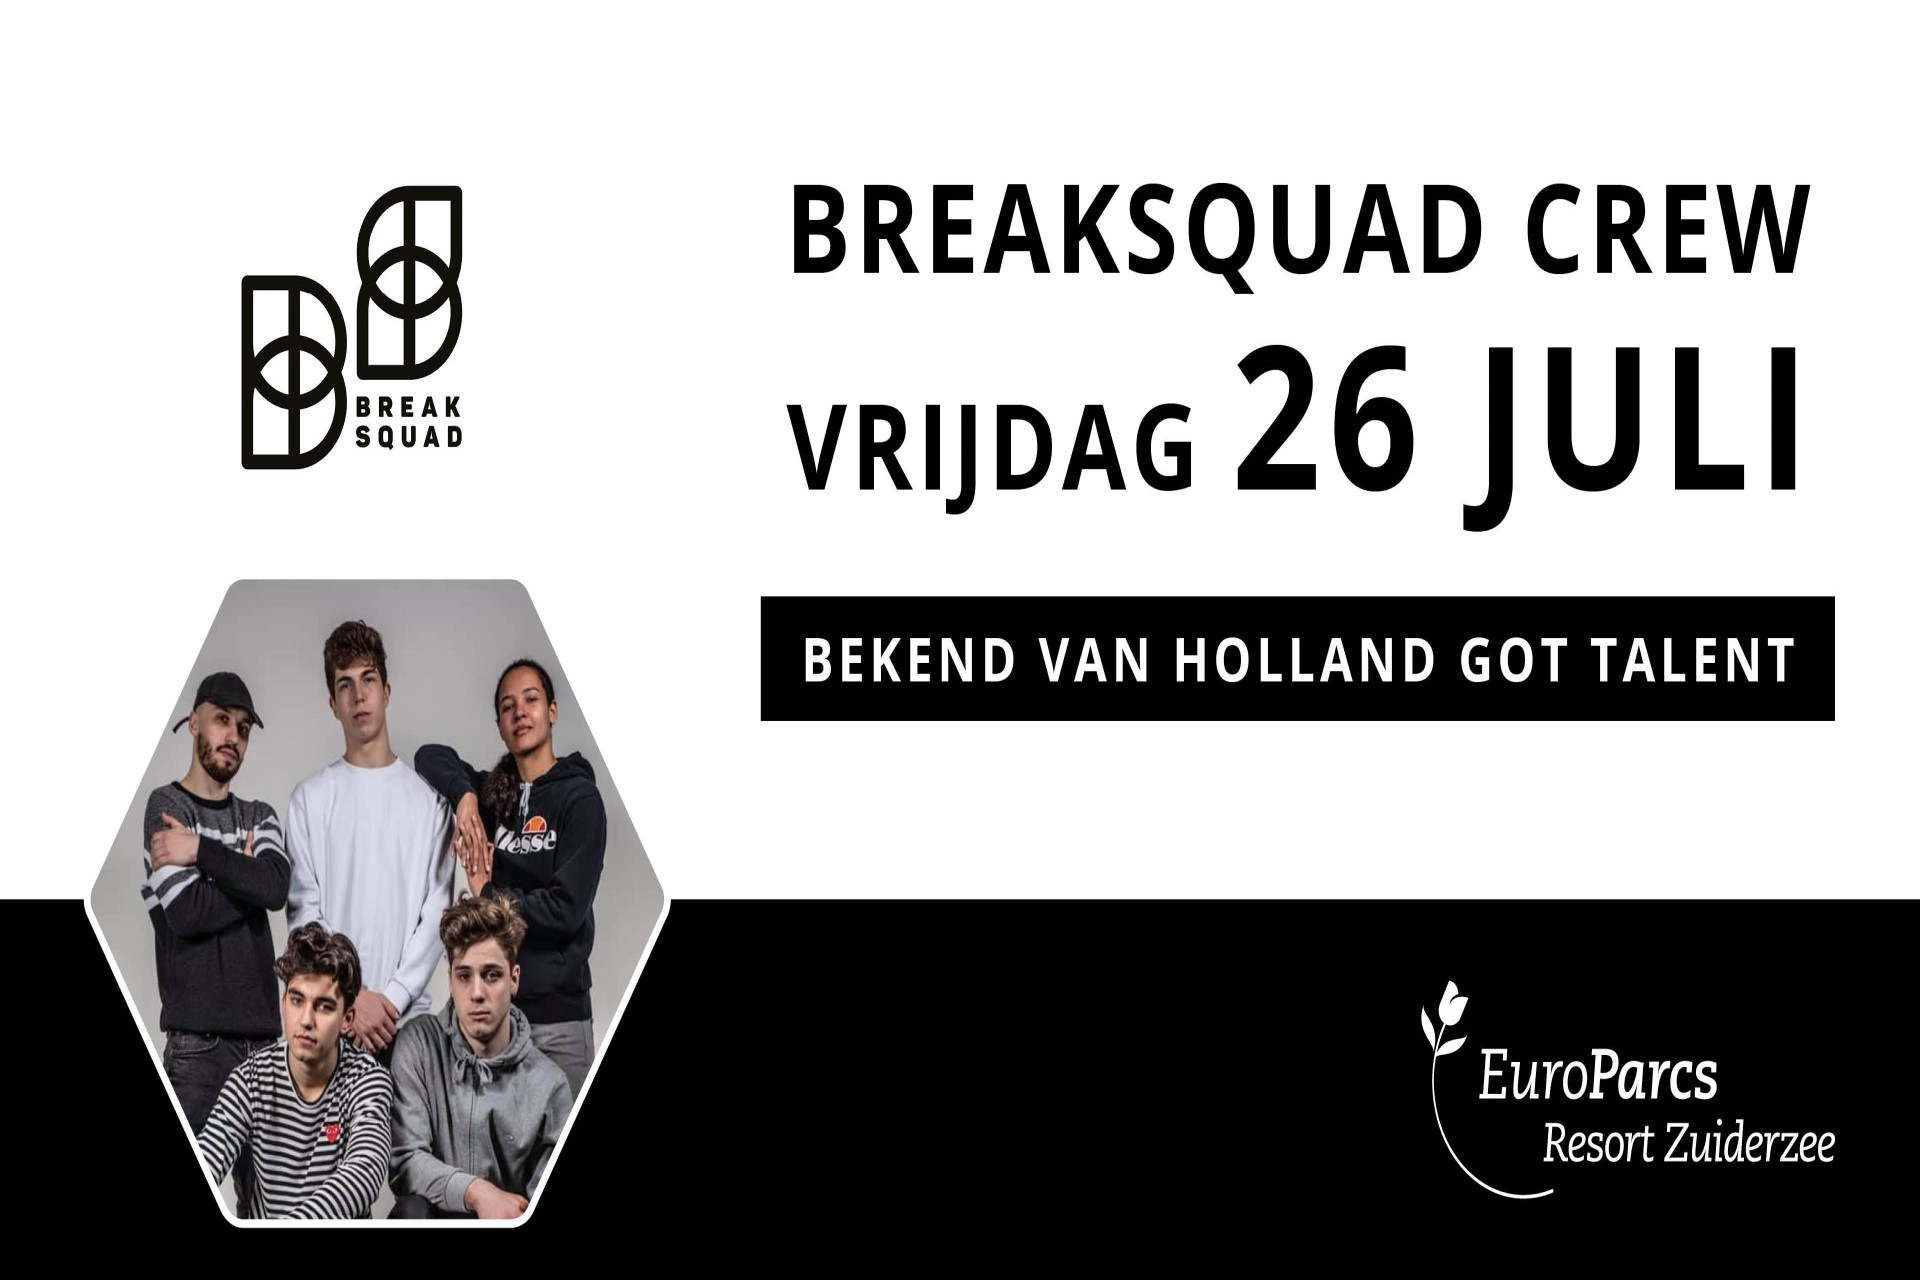 Breaksquad Crew workshop & show